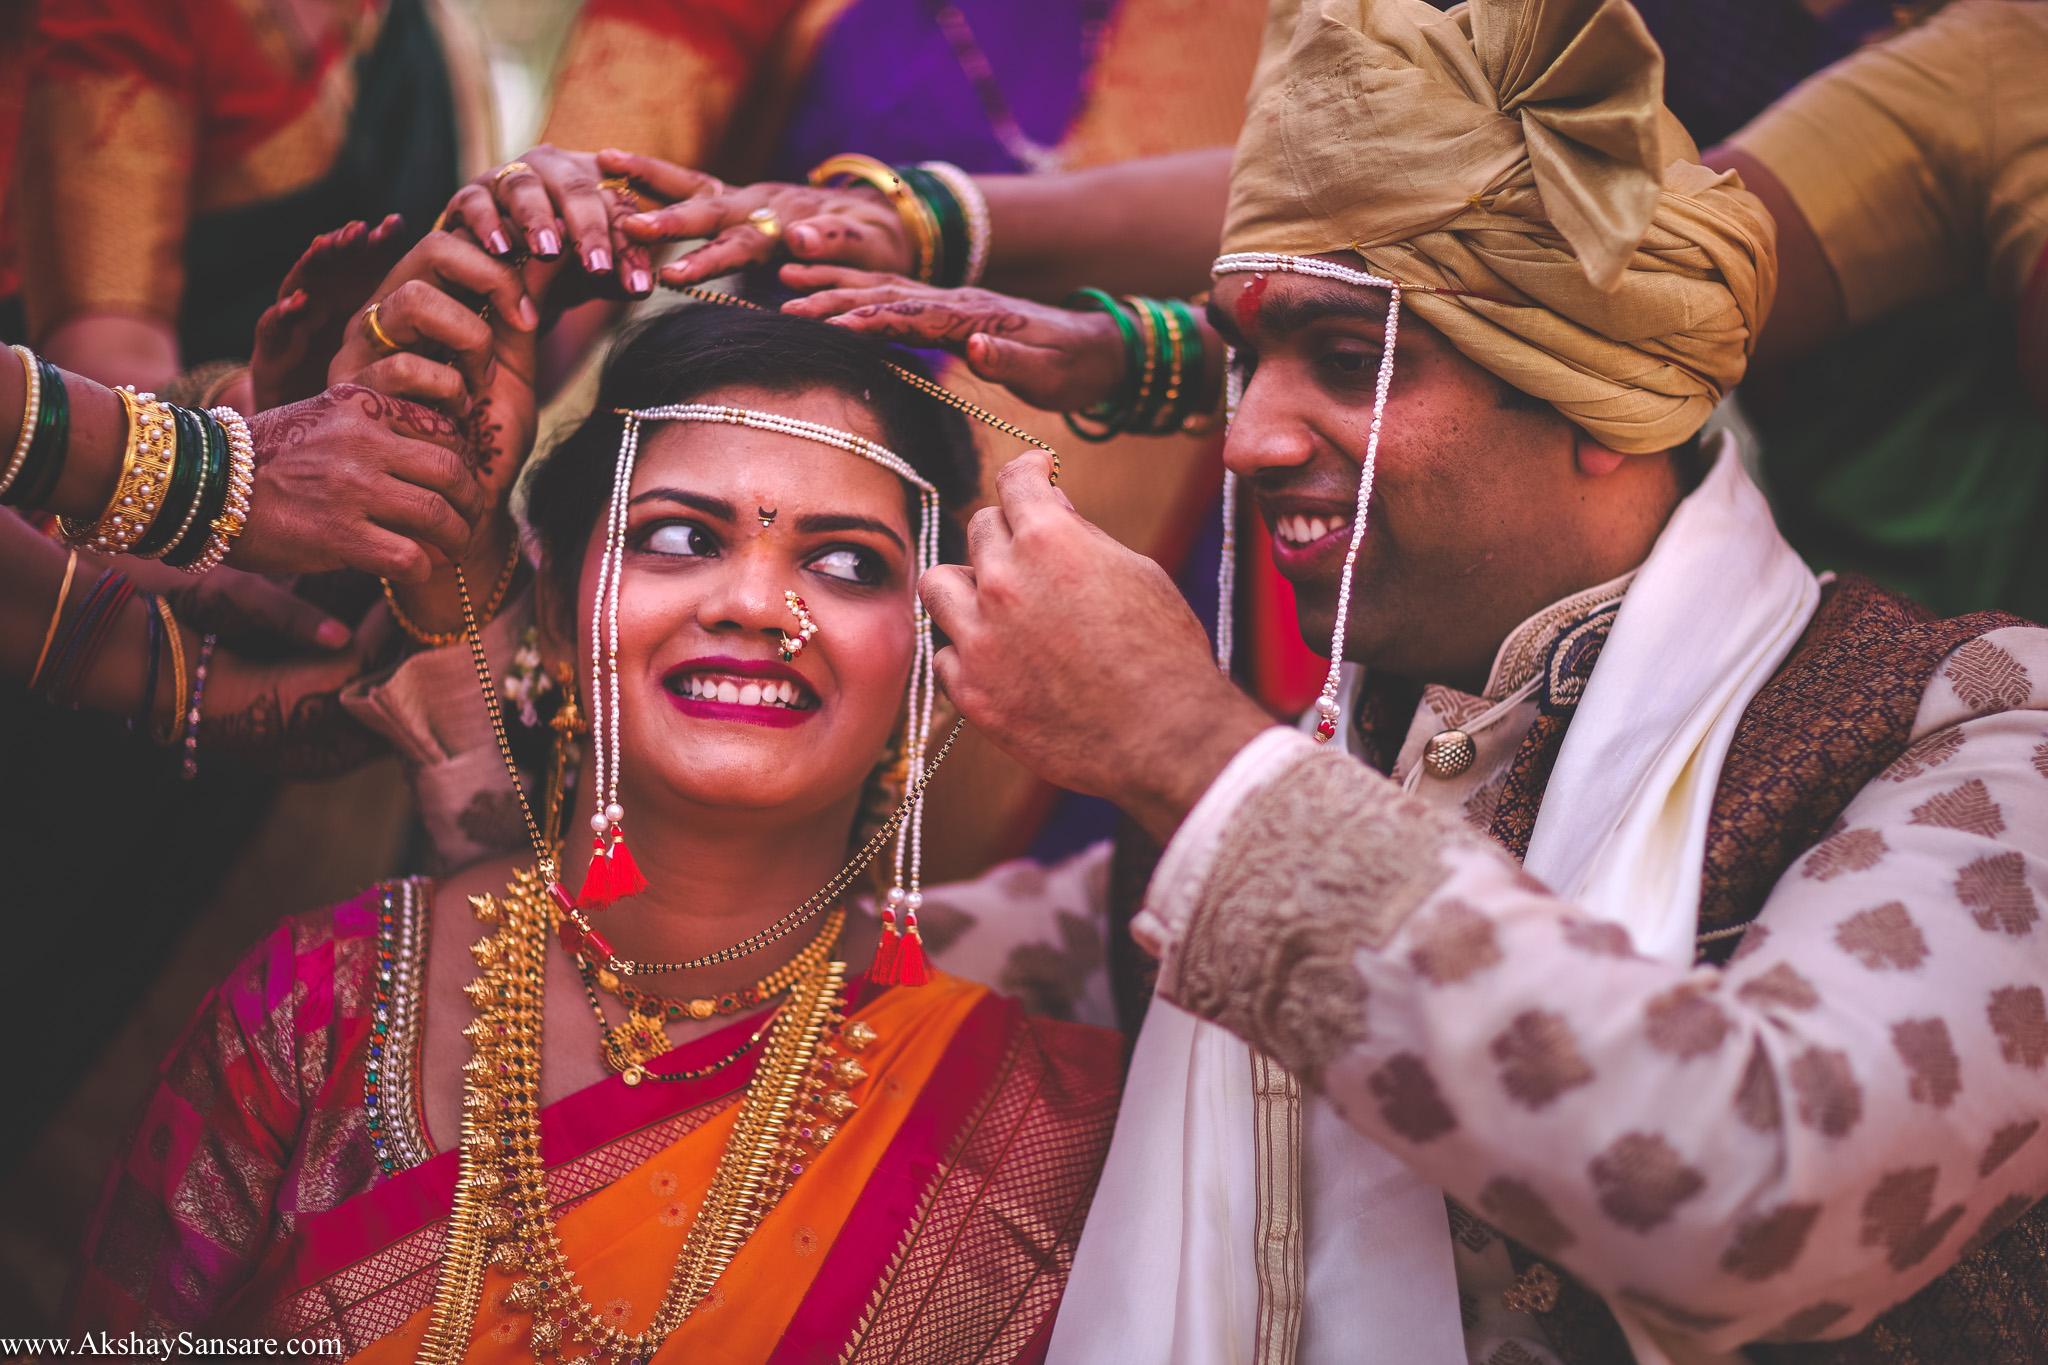 Salil x Kimaya Akshay Sansare Photography Candid wedding Photographer in mumbai best(22).jpg